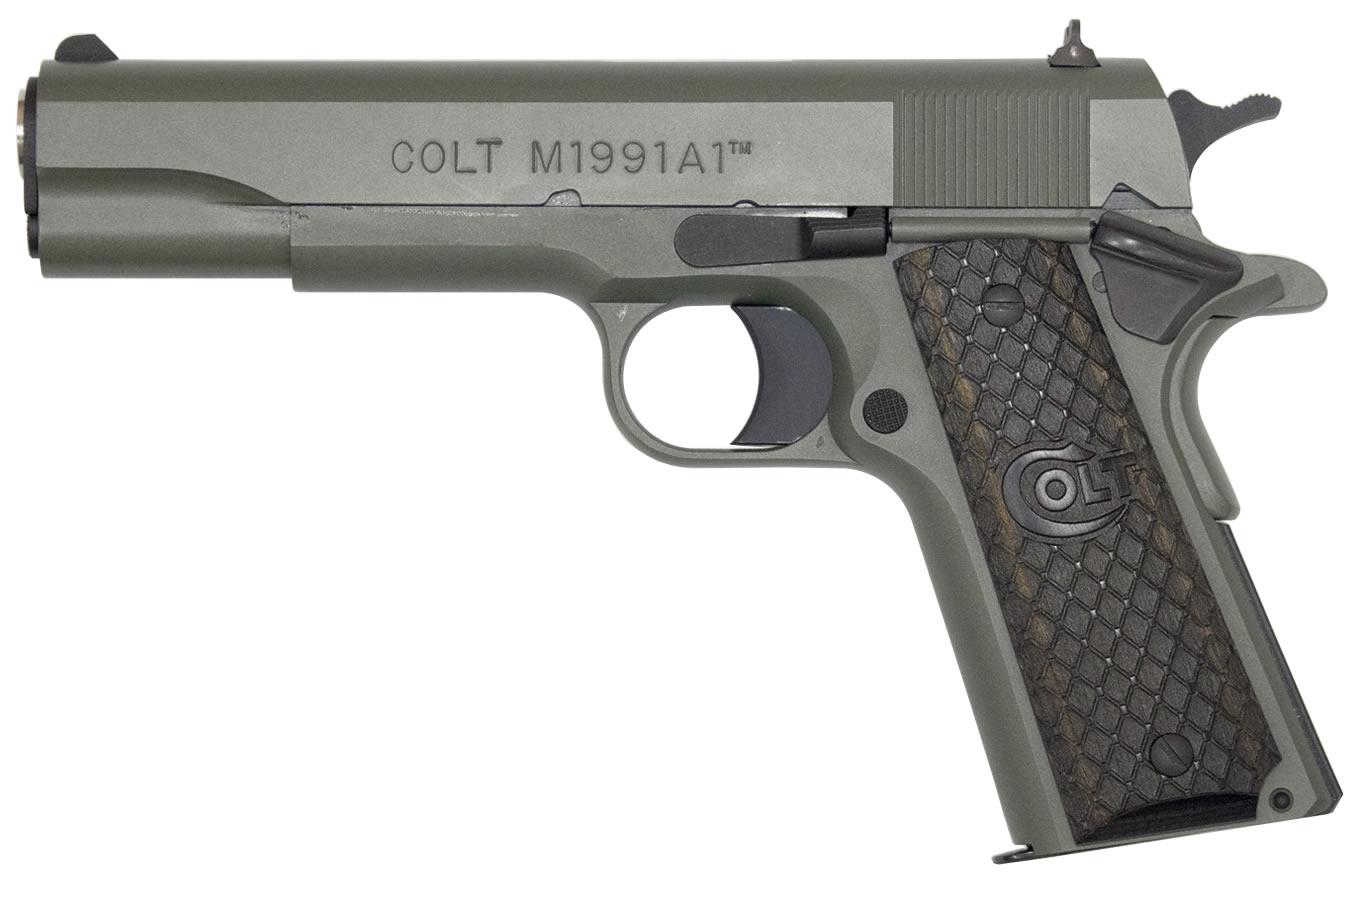 Colt M1911-A1 45 ACP ODG Talo Exclusive | Sportsman's ...